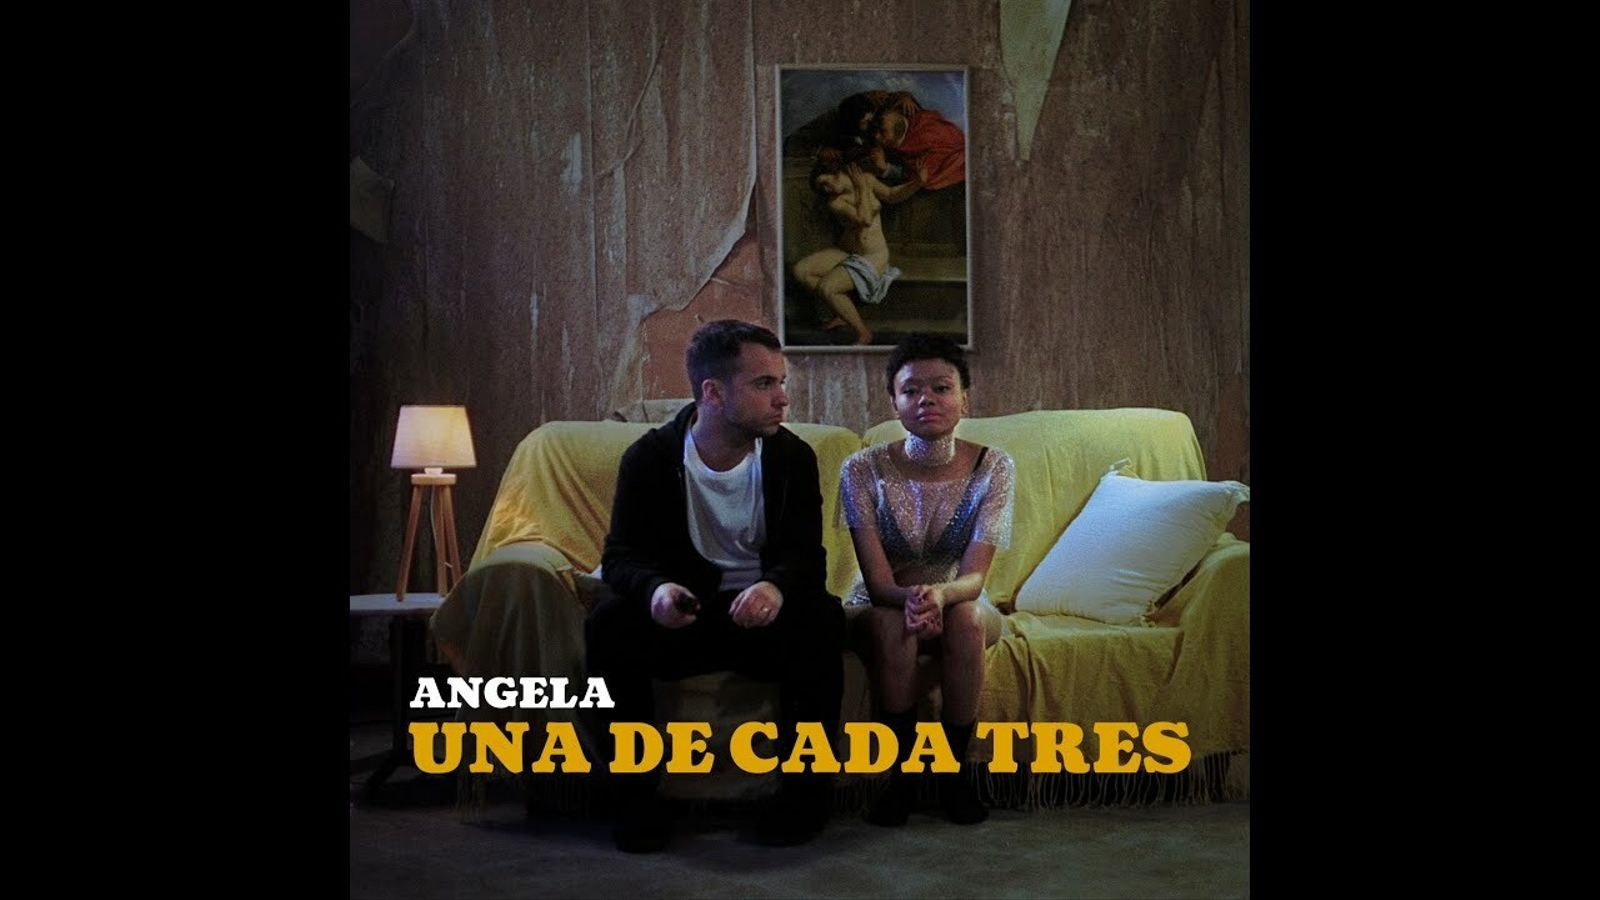 Angela - Una de cada Tres